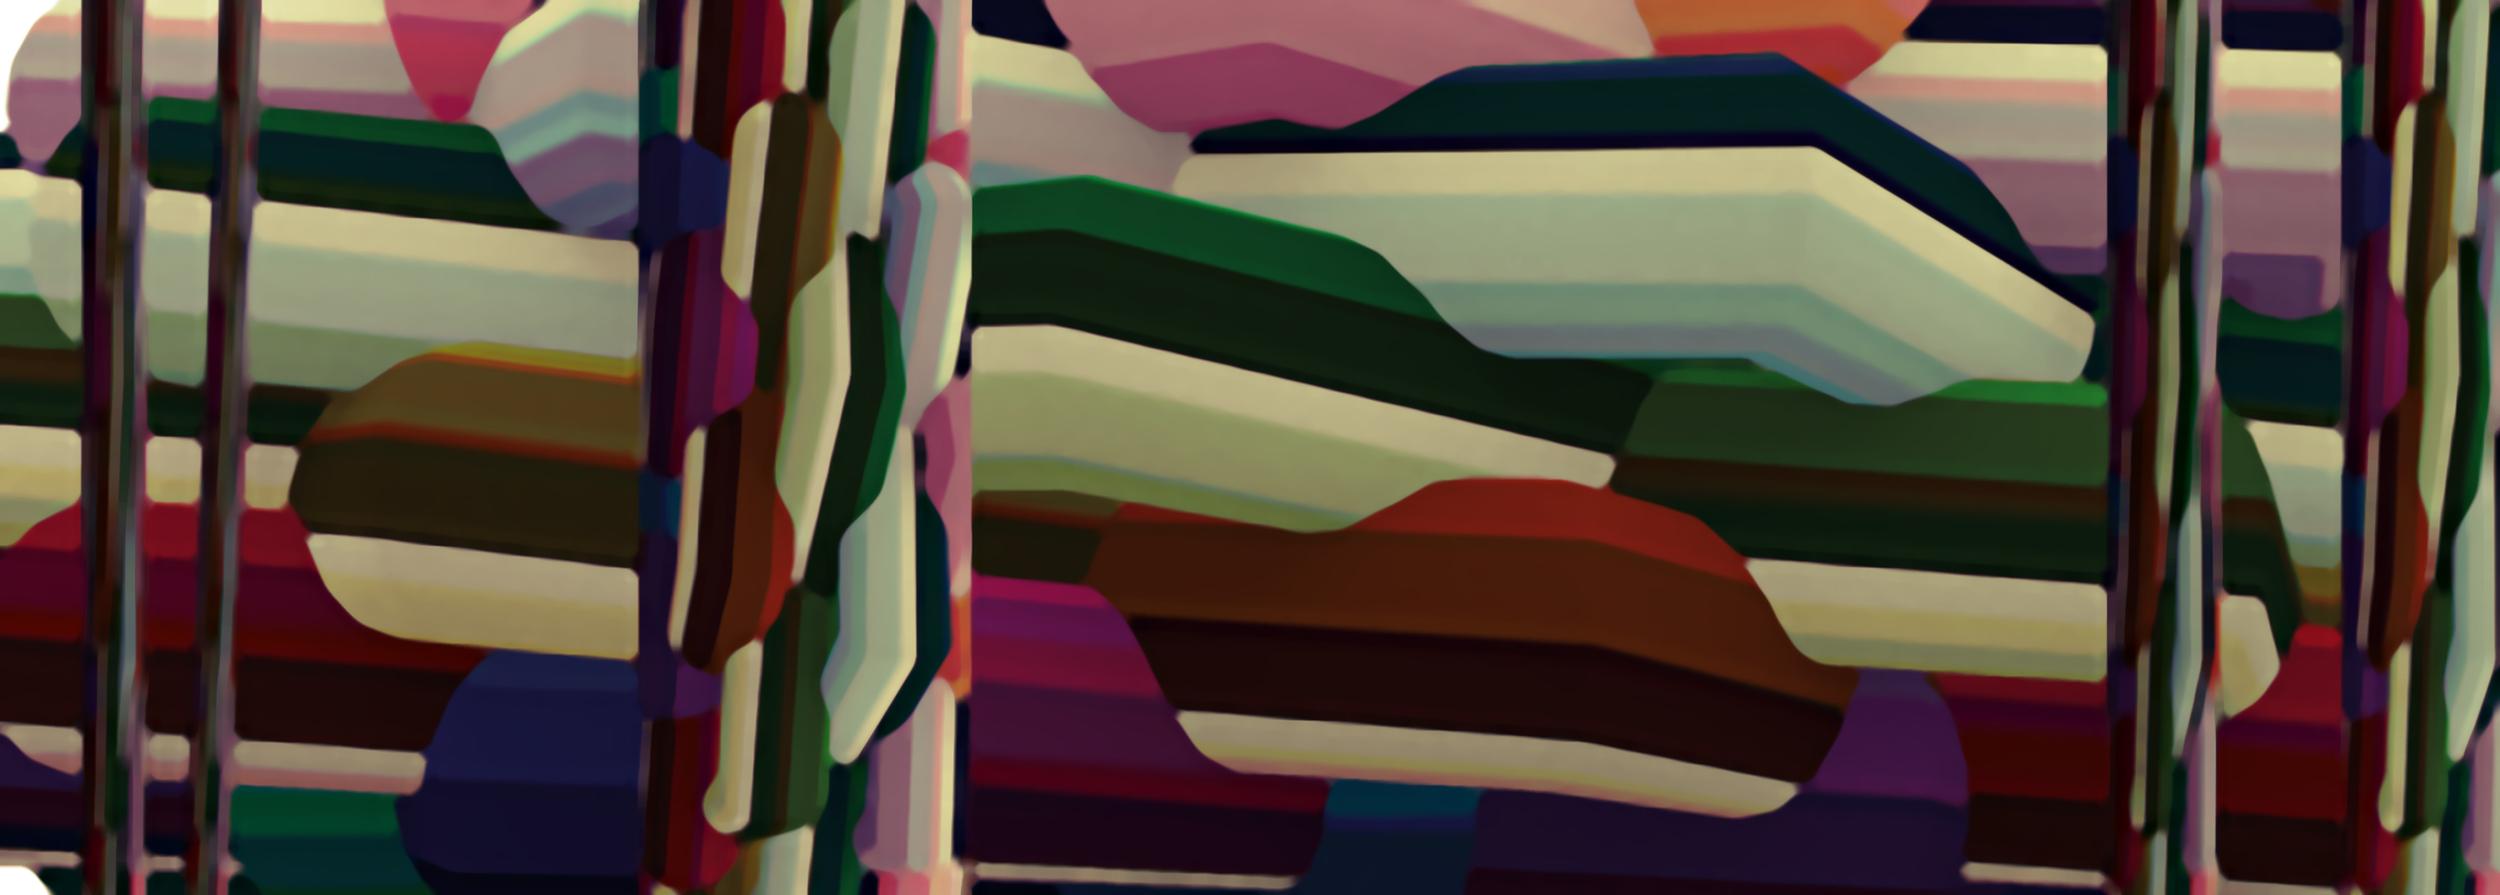 COMPACTA1-TREESmedian-hi.jpg